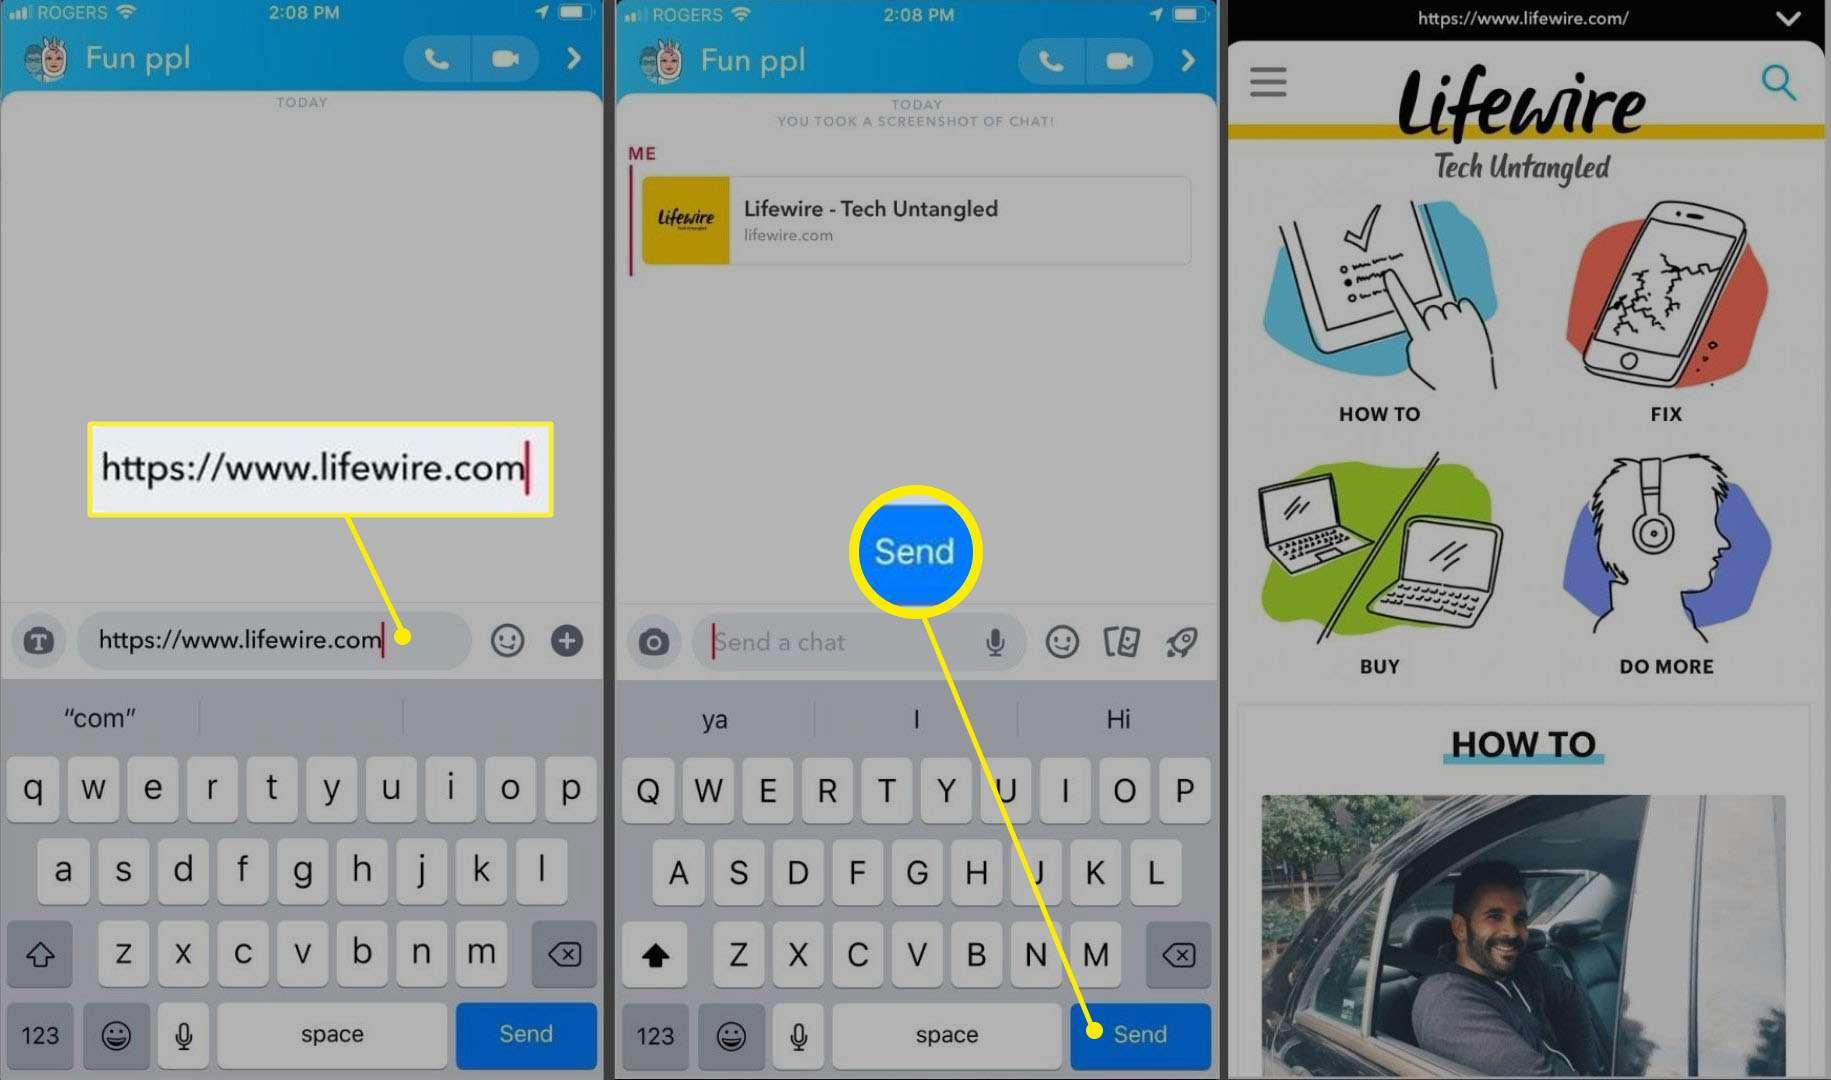 Three screenshots of the Snapchat app for iOS.